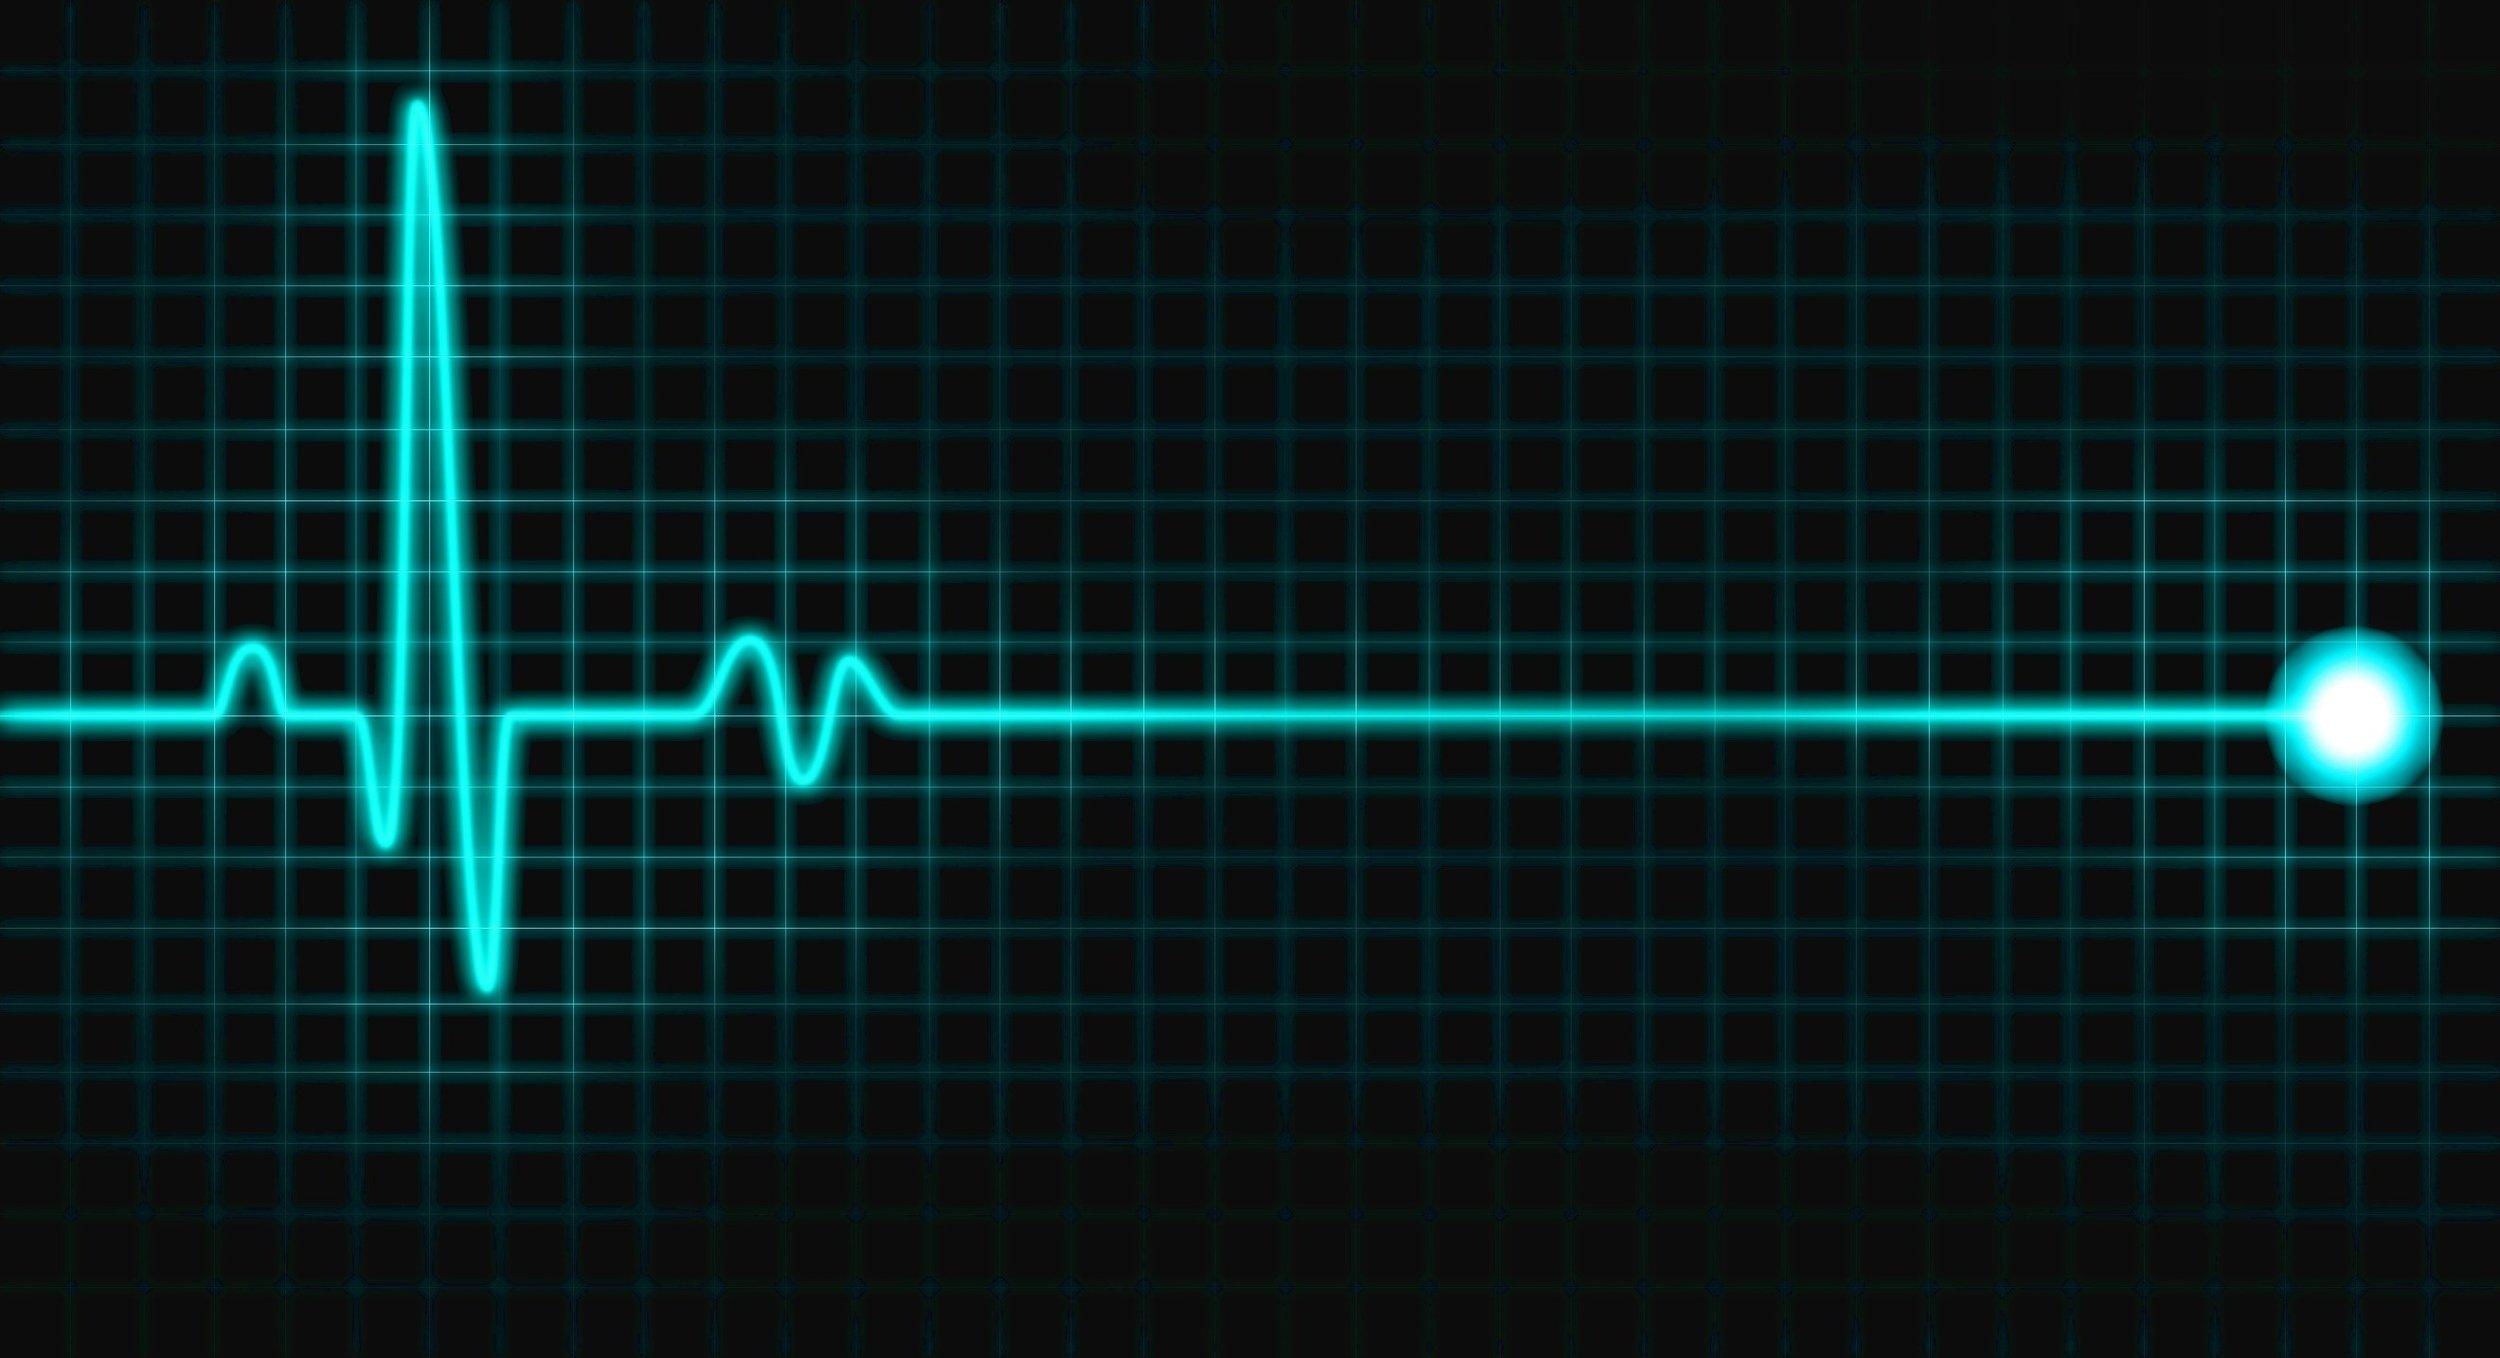 glowing-bluegreen-cardiogram.jpg